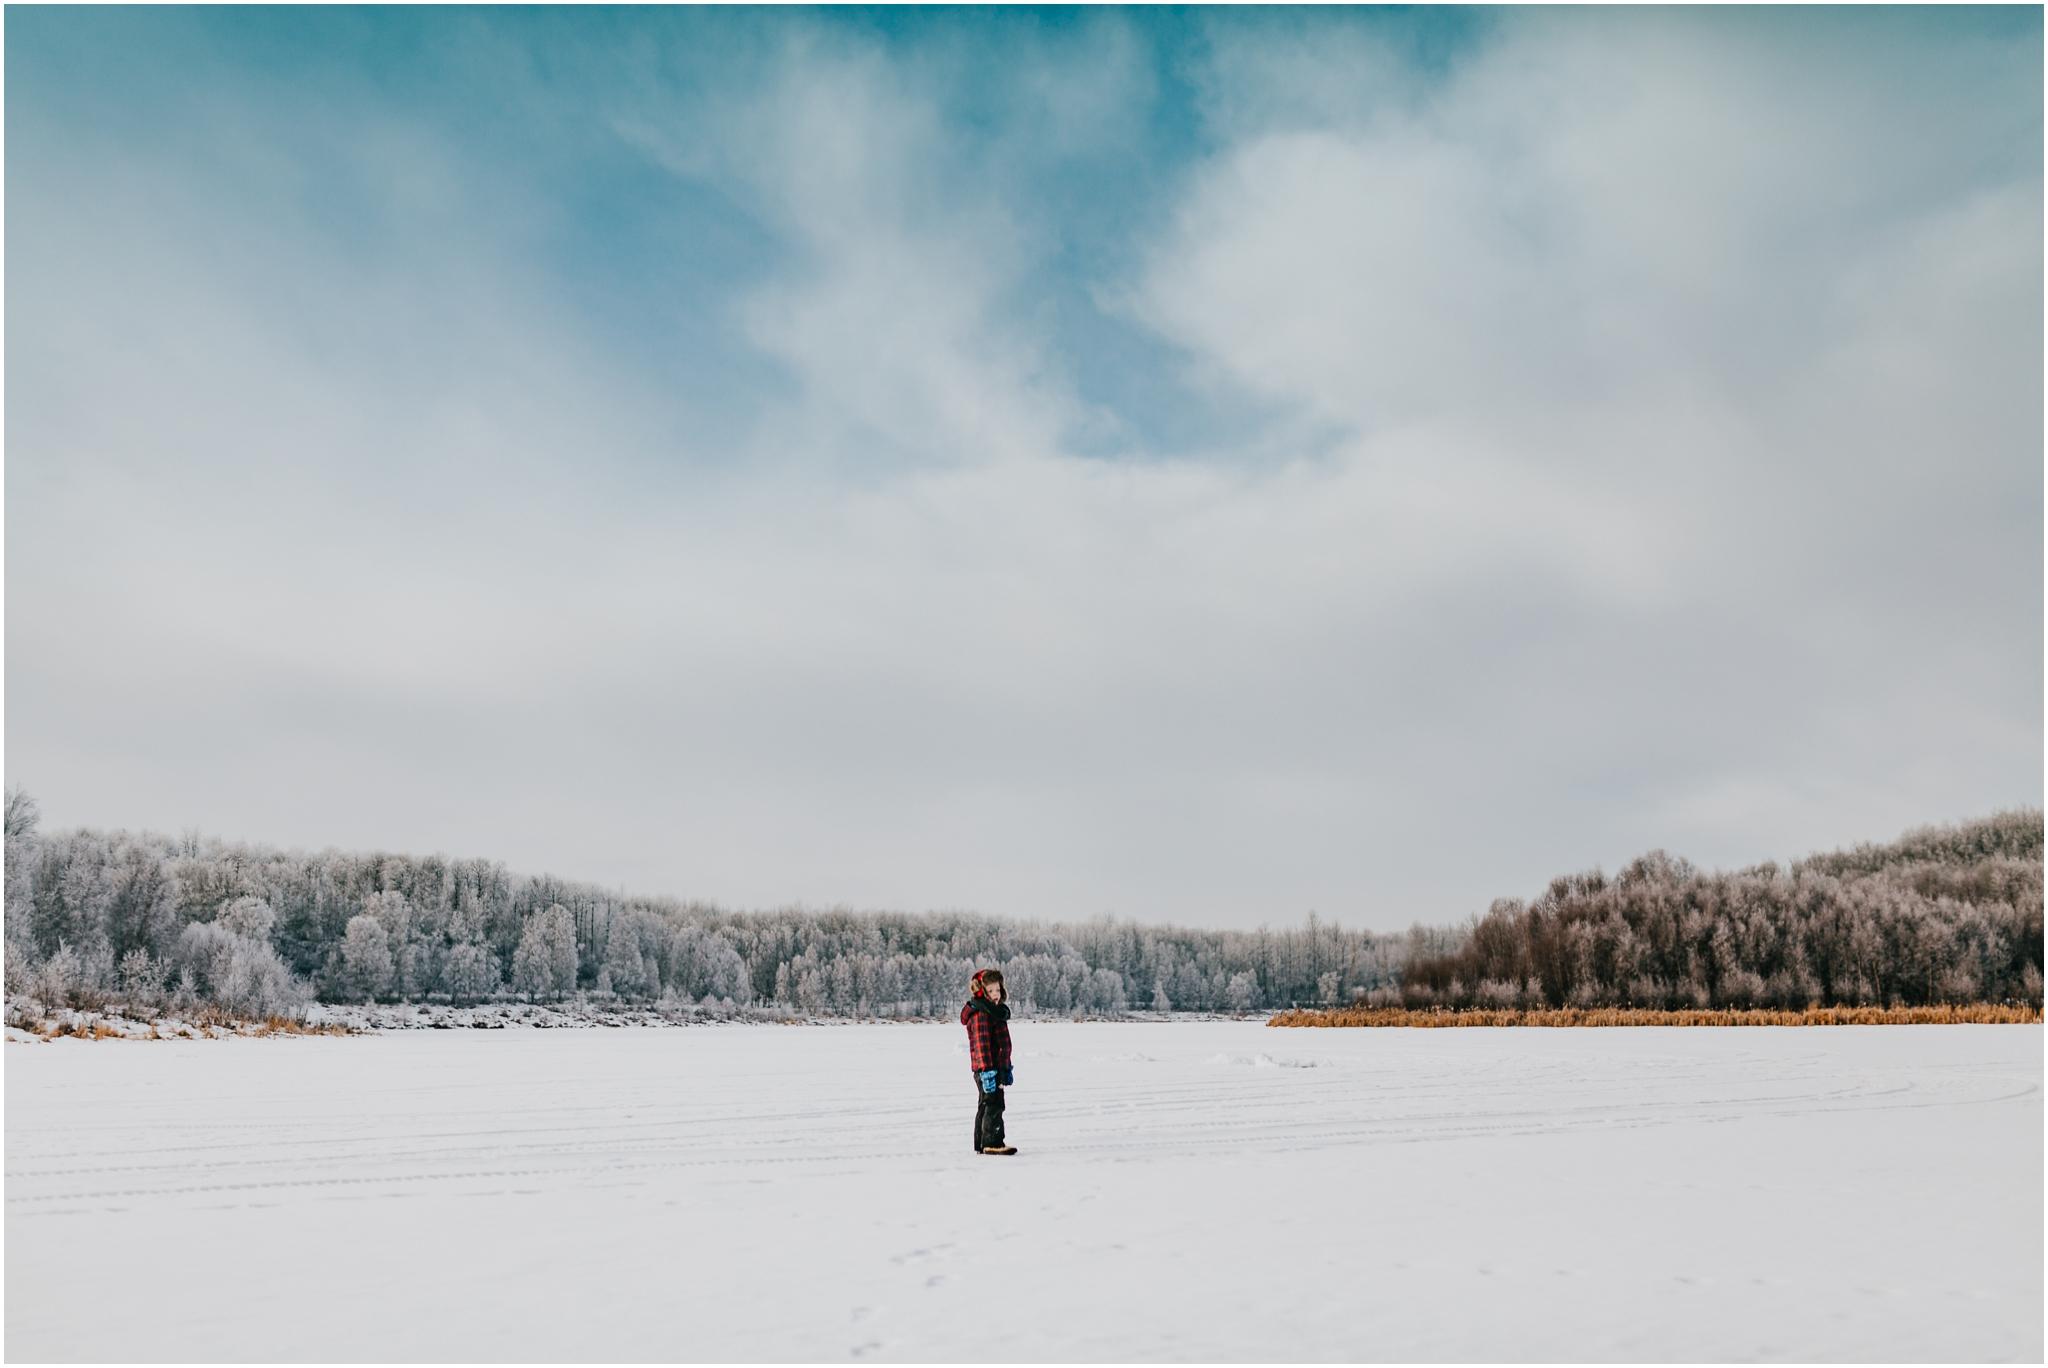 Edmonton Photographer - Adventure Photography - Winter Scene Alberta Lake